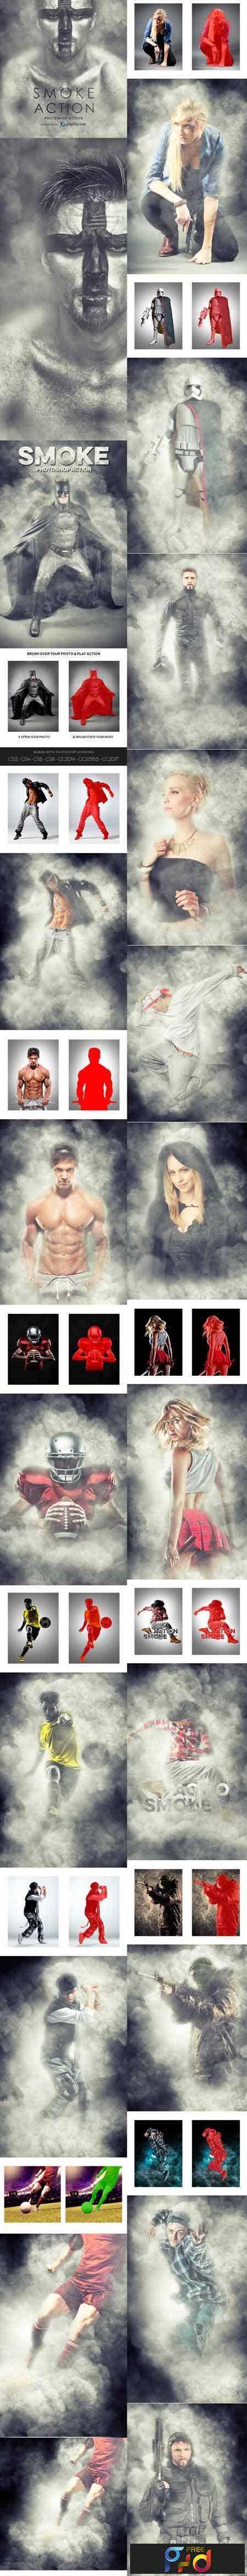 freepsdvn-com_1482219639_smoke-photoshop-action-19053471